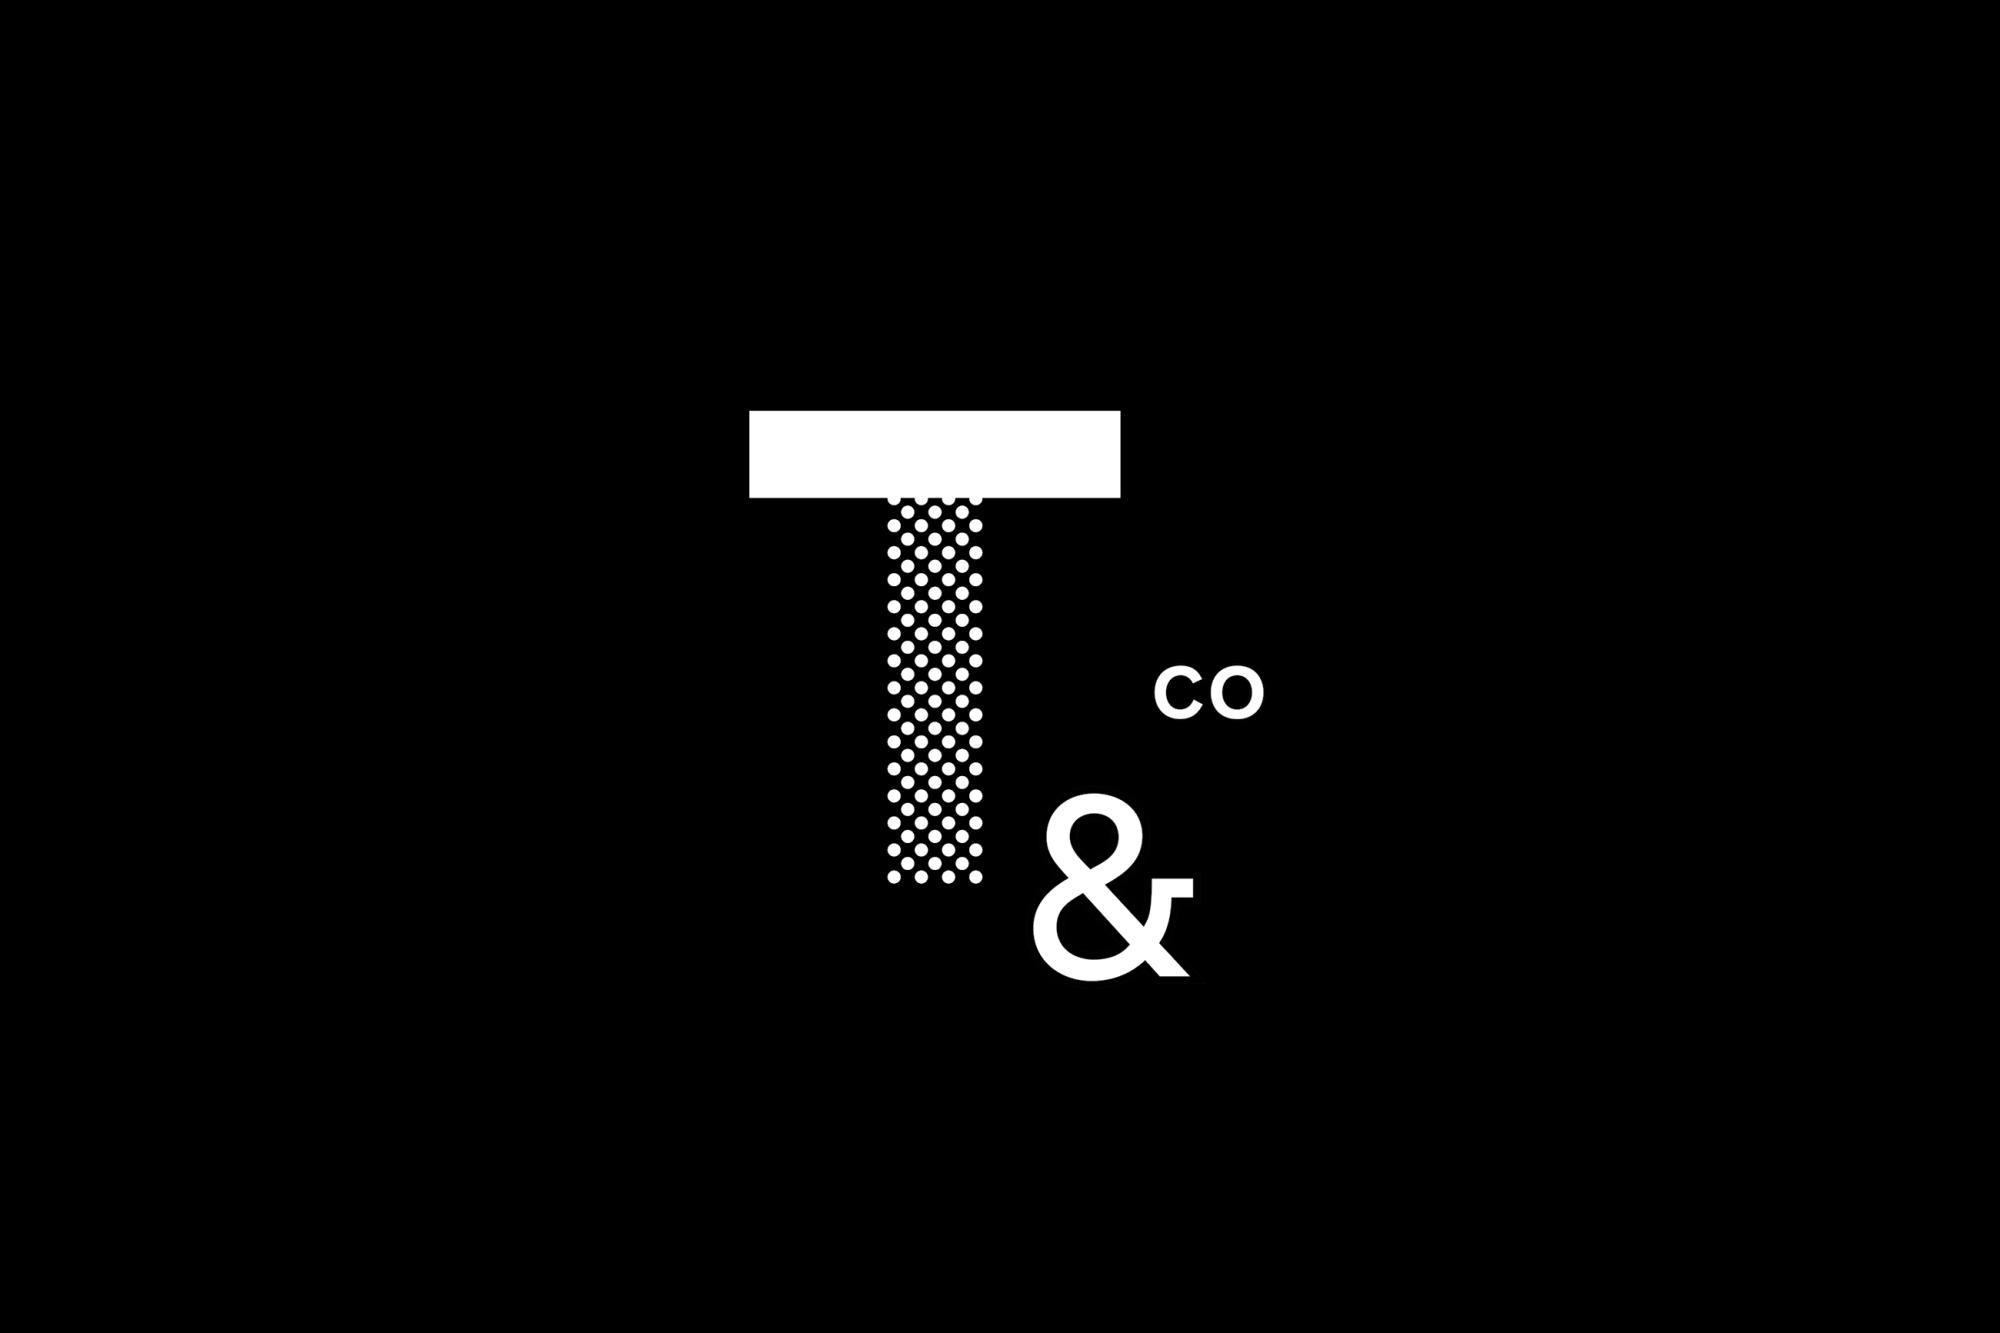 Graphisme Geneve graphic design graphique direction artistique logo identité visuelle identity branding brand  tartares & co bar restaurant grand prix 2015